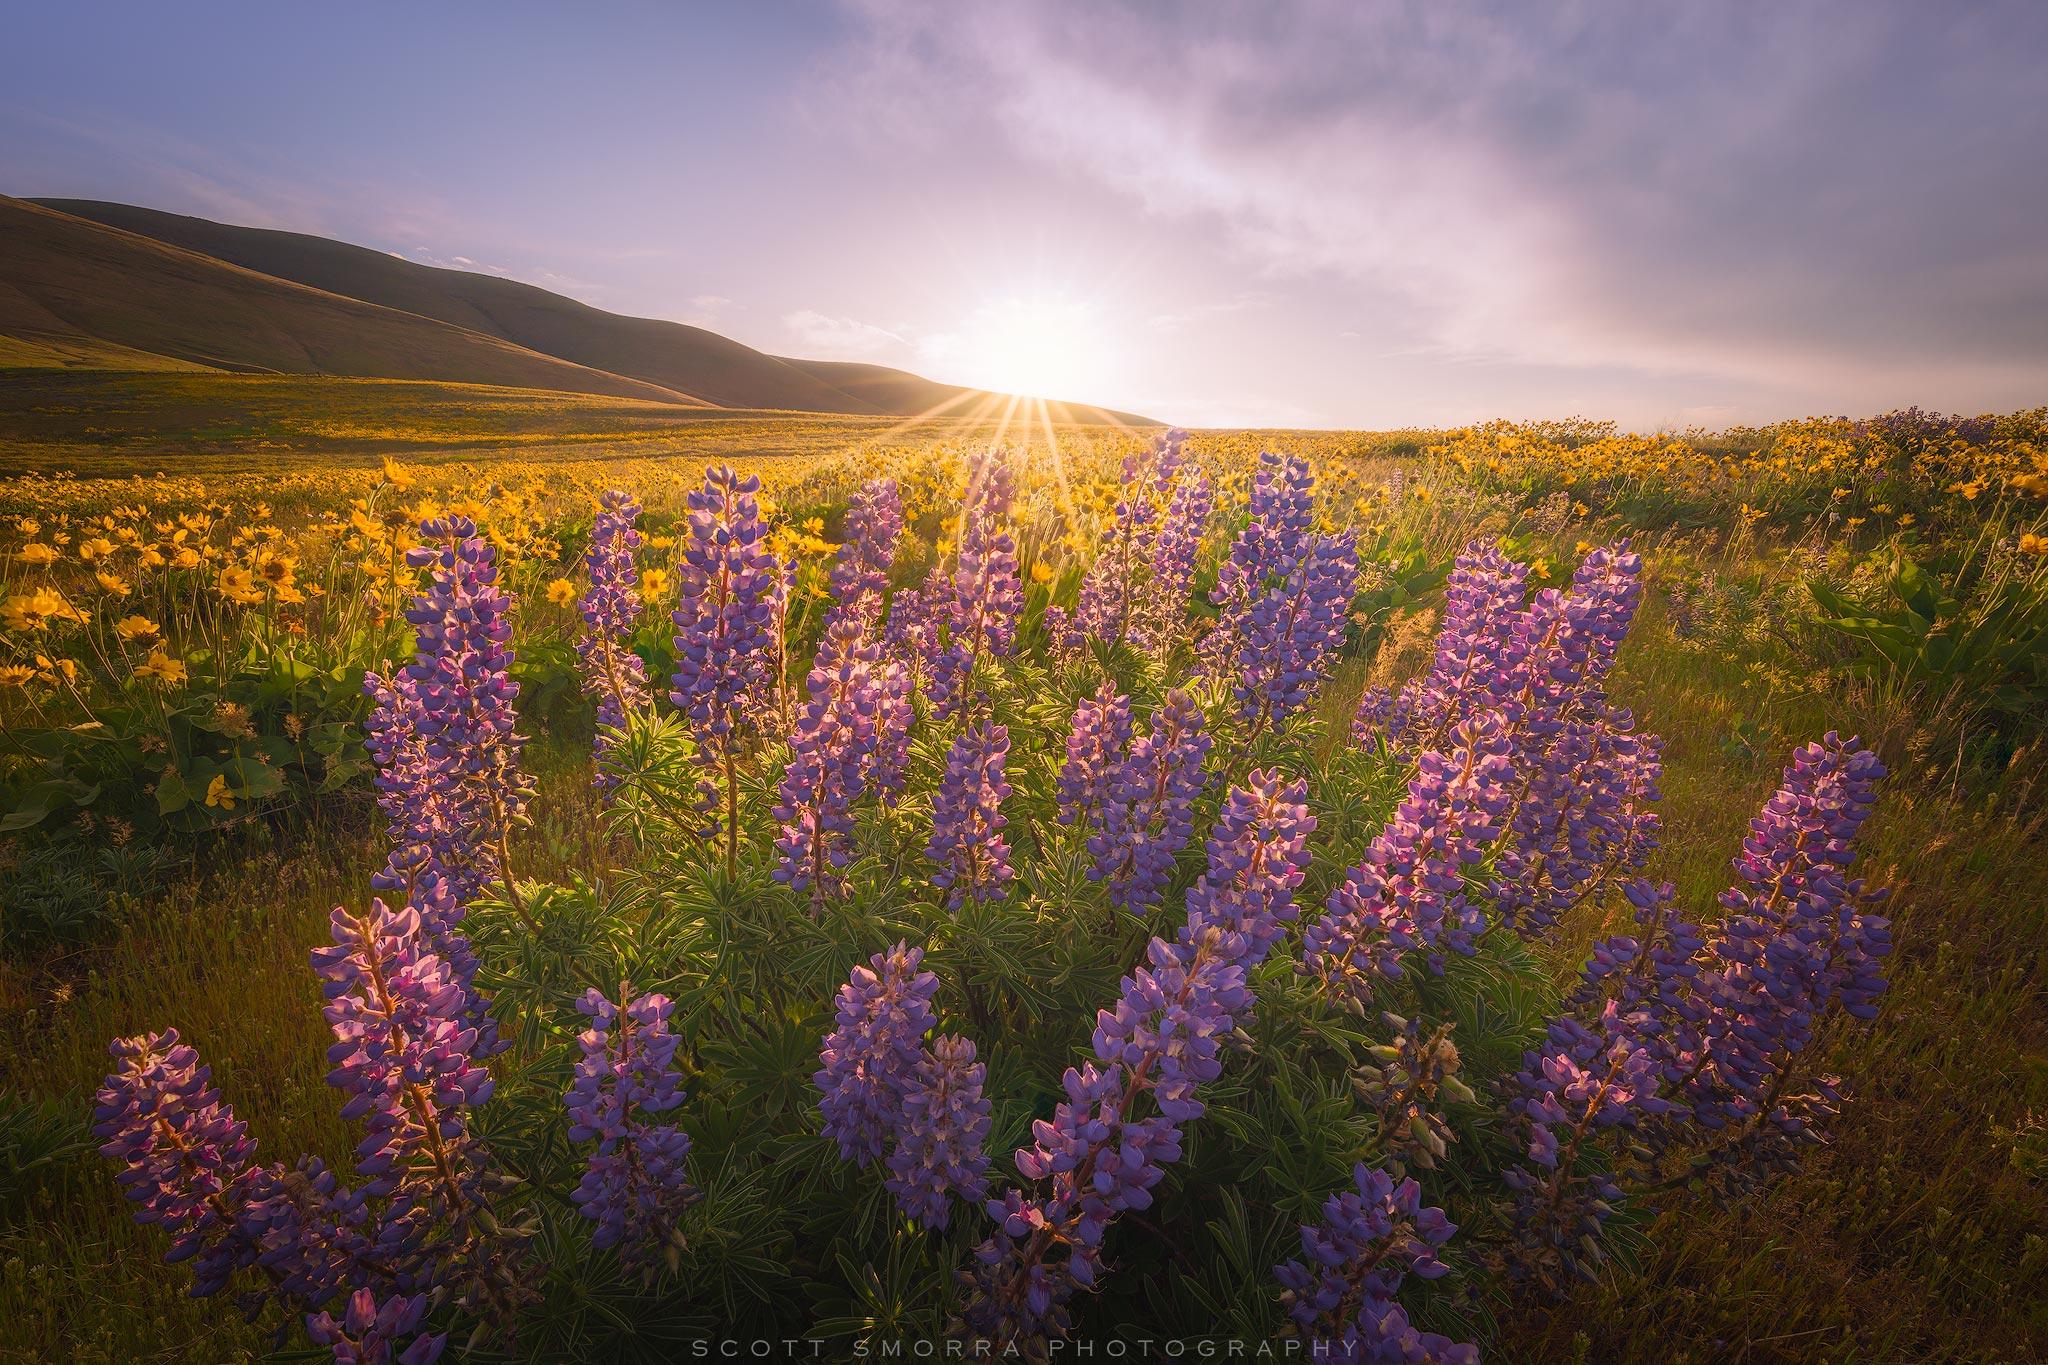 Washington, Columbia Hills State Park, Sunrise, Wildflowers, Columbia Gorge Broad Leaf Lupine, Arrowleaf Balsamroot, bloom, photo